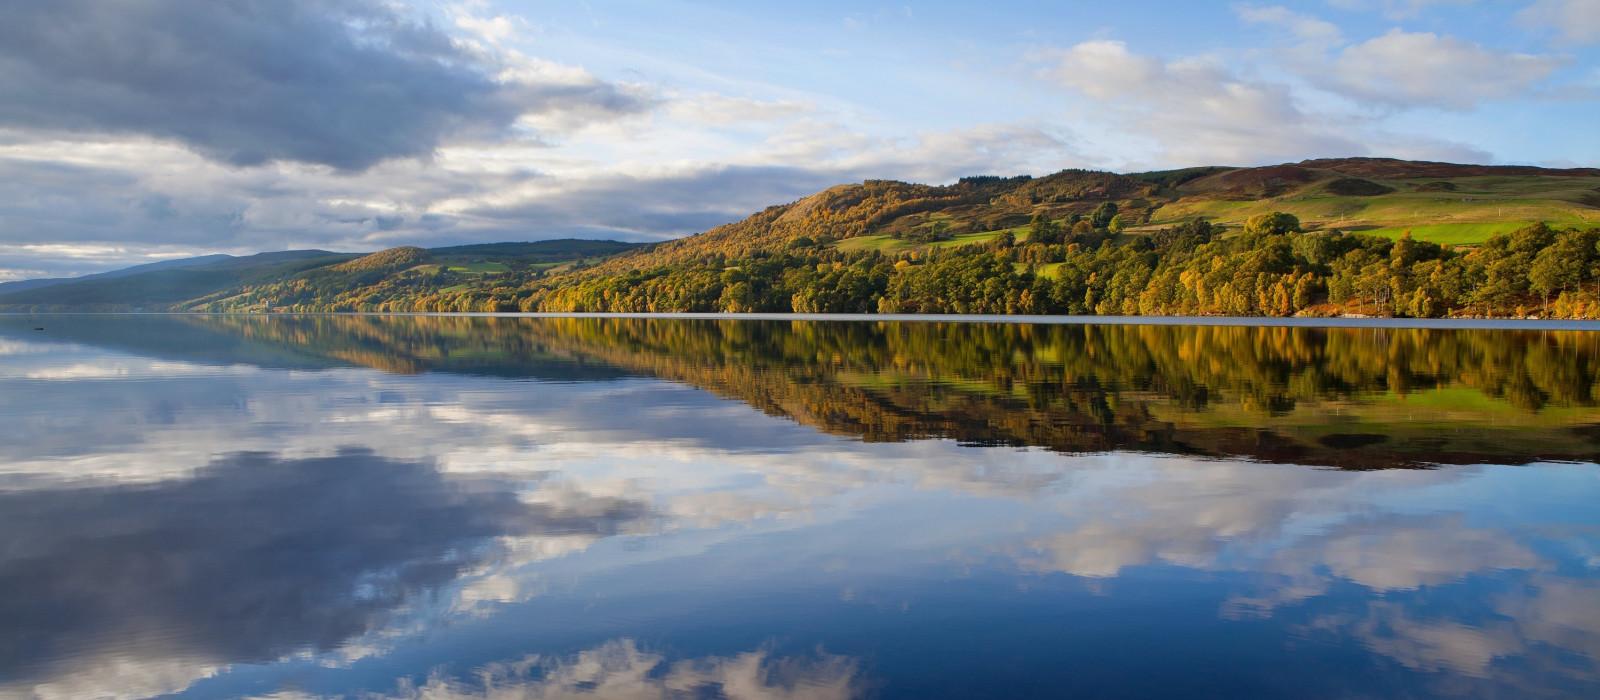 Destination Inverness UK & Ireland